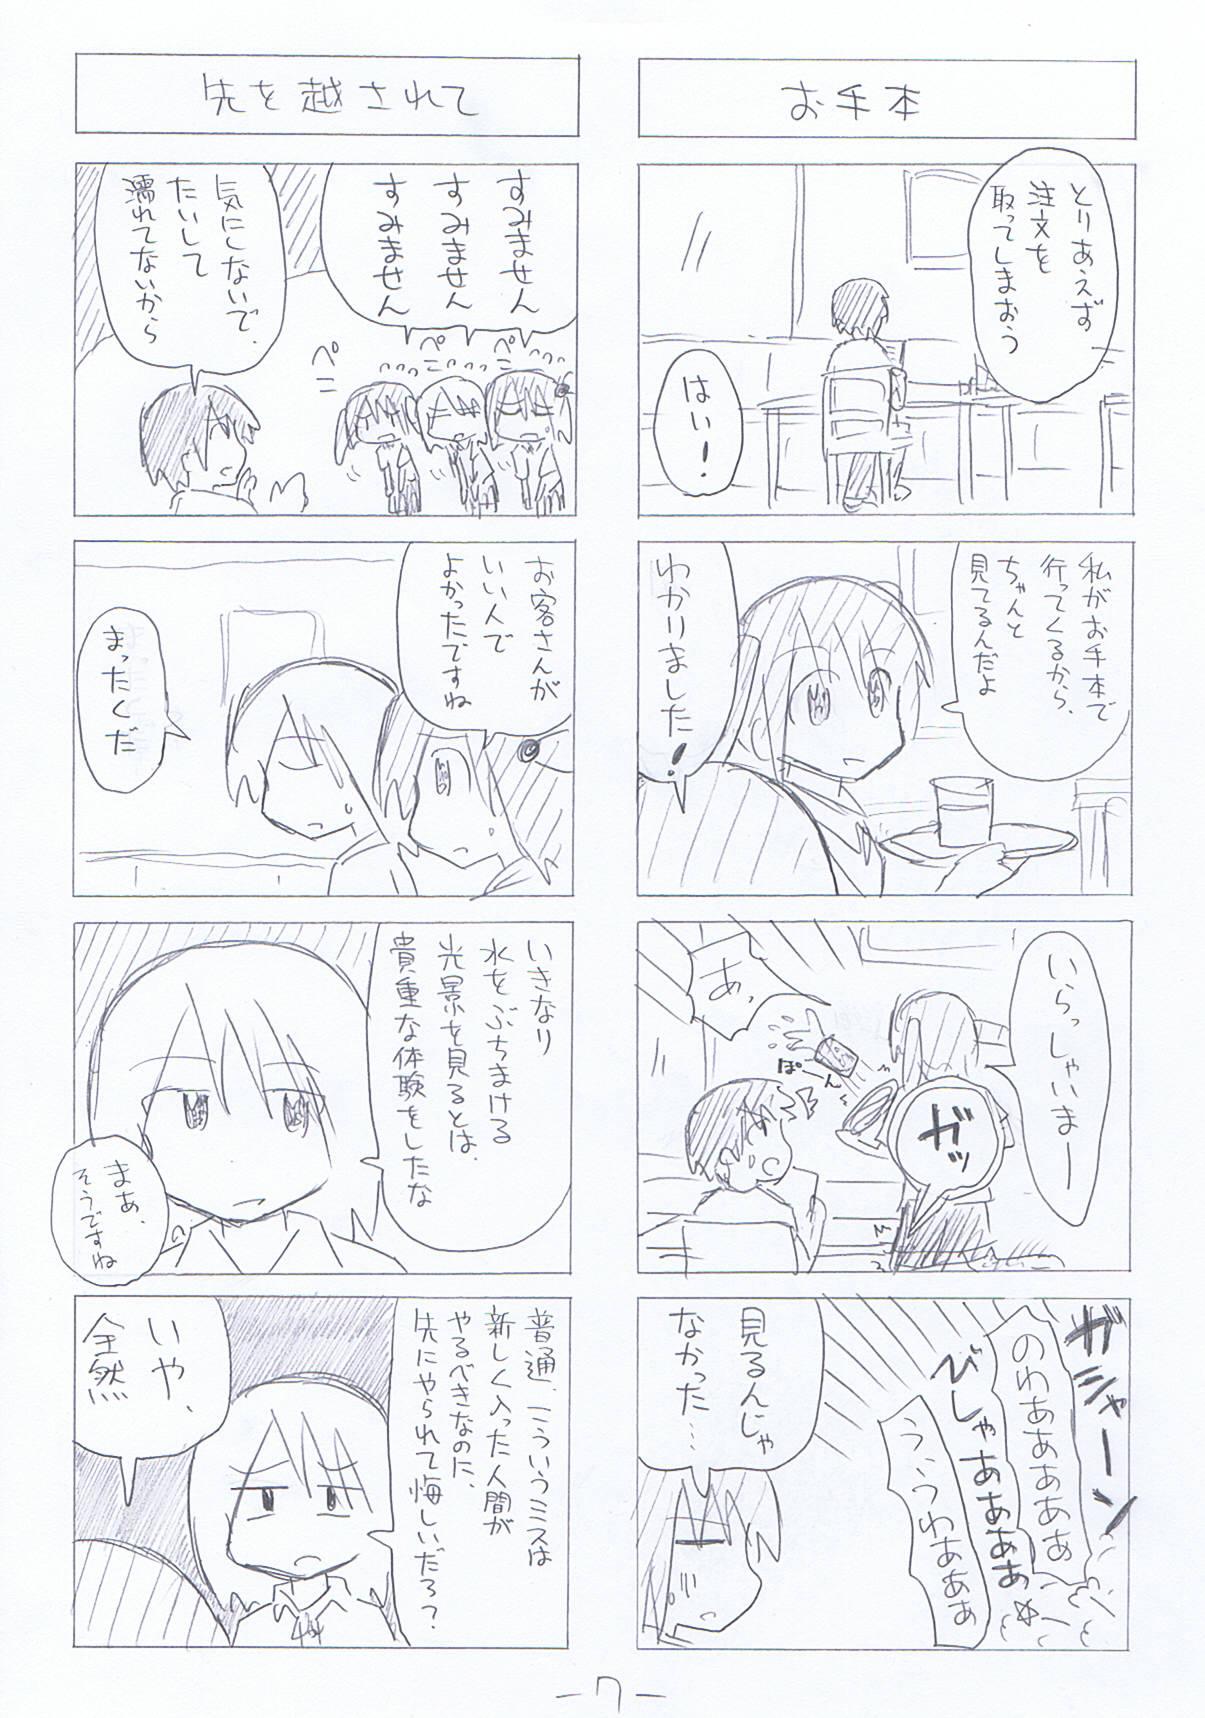 hitotoki-3-7.jpg